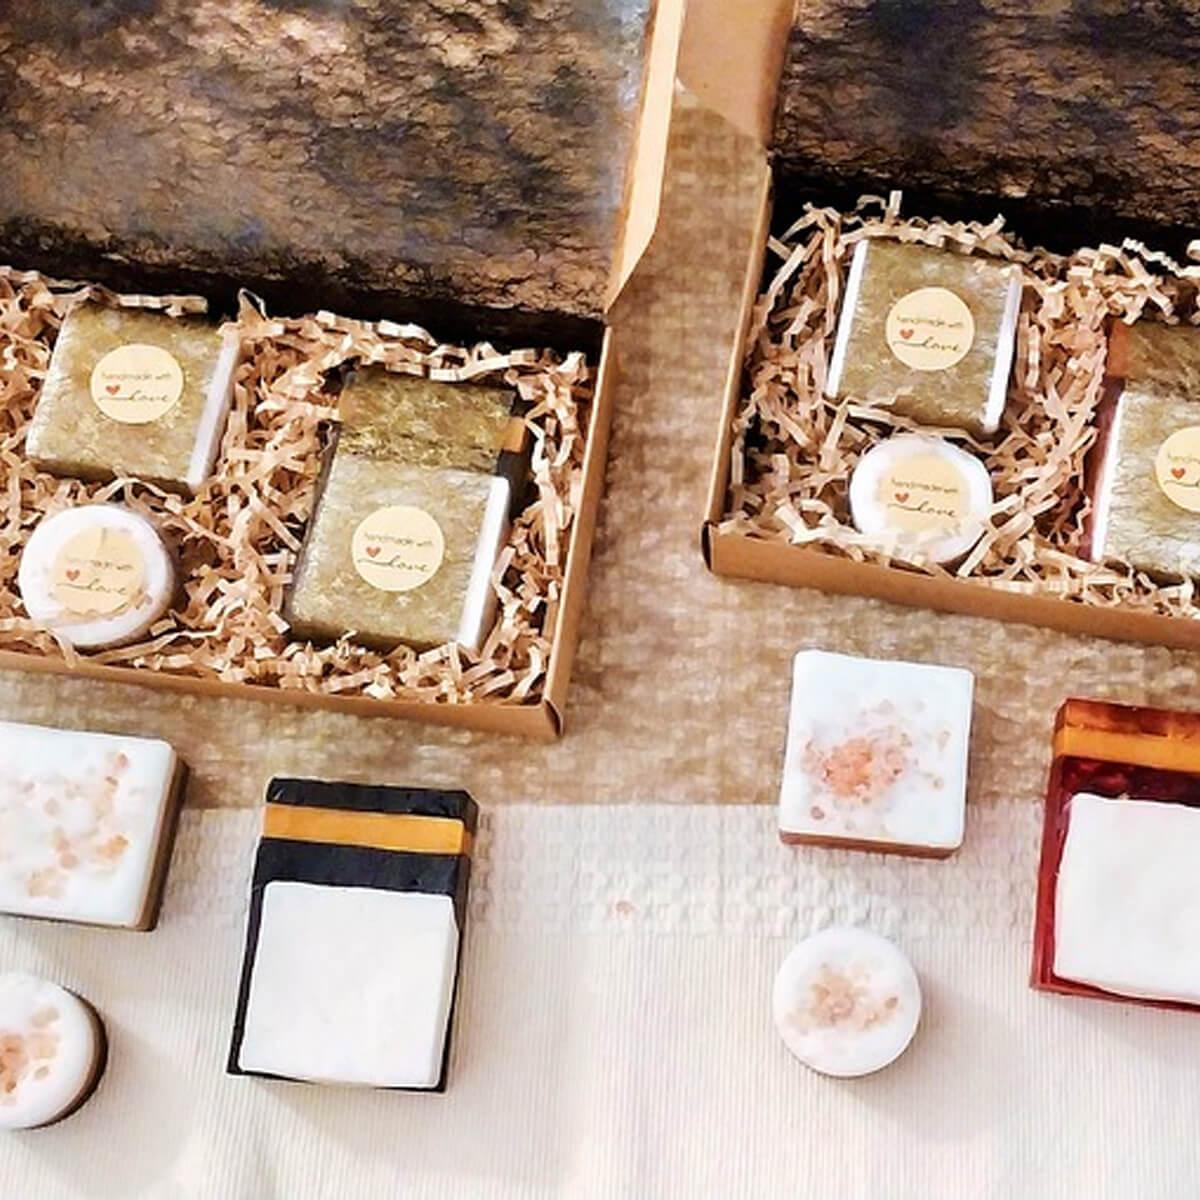 Achetez_nos_Box_bio_maquillage_manucure_Ado_fille_AM-Cosmetiques.jpg